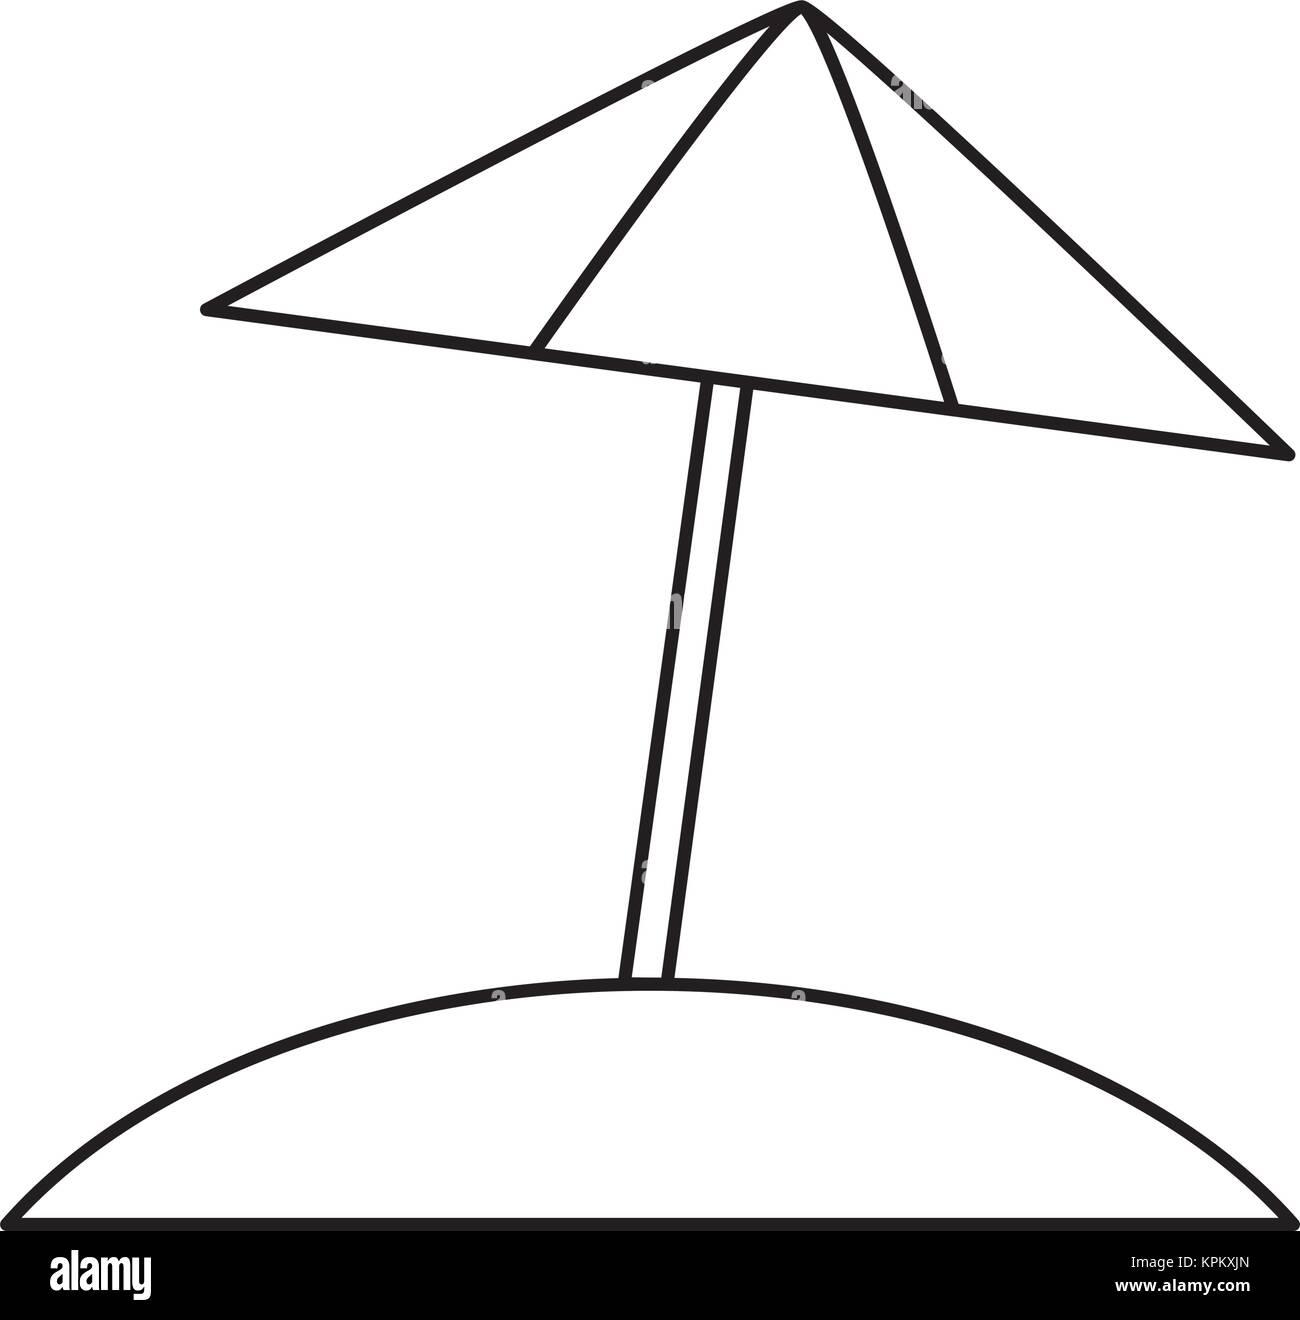 Isolated umbrella design stock image